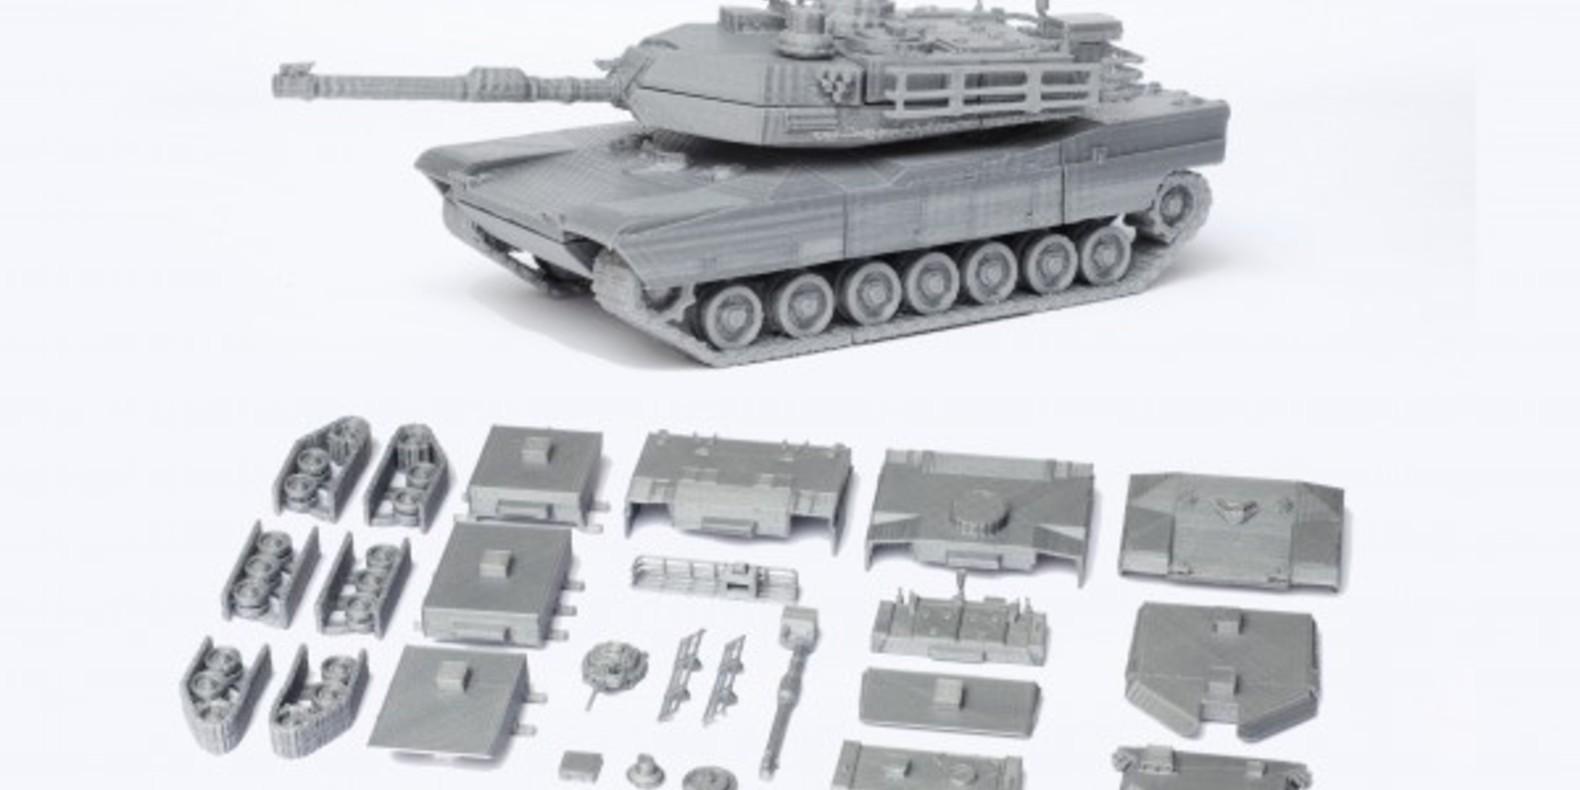 tanks-duc-tran-formbyte-fichier-3d-stl-gratuit-cults-4